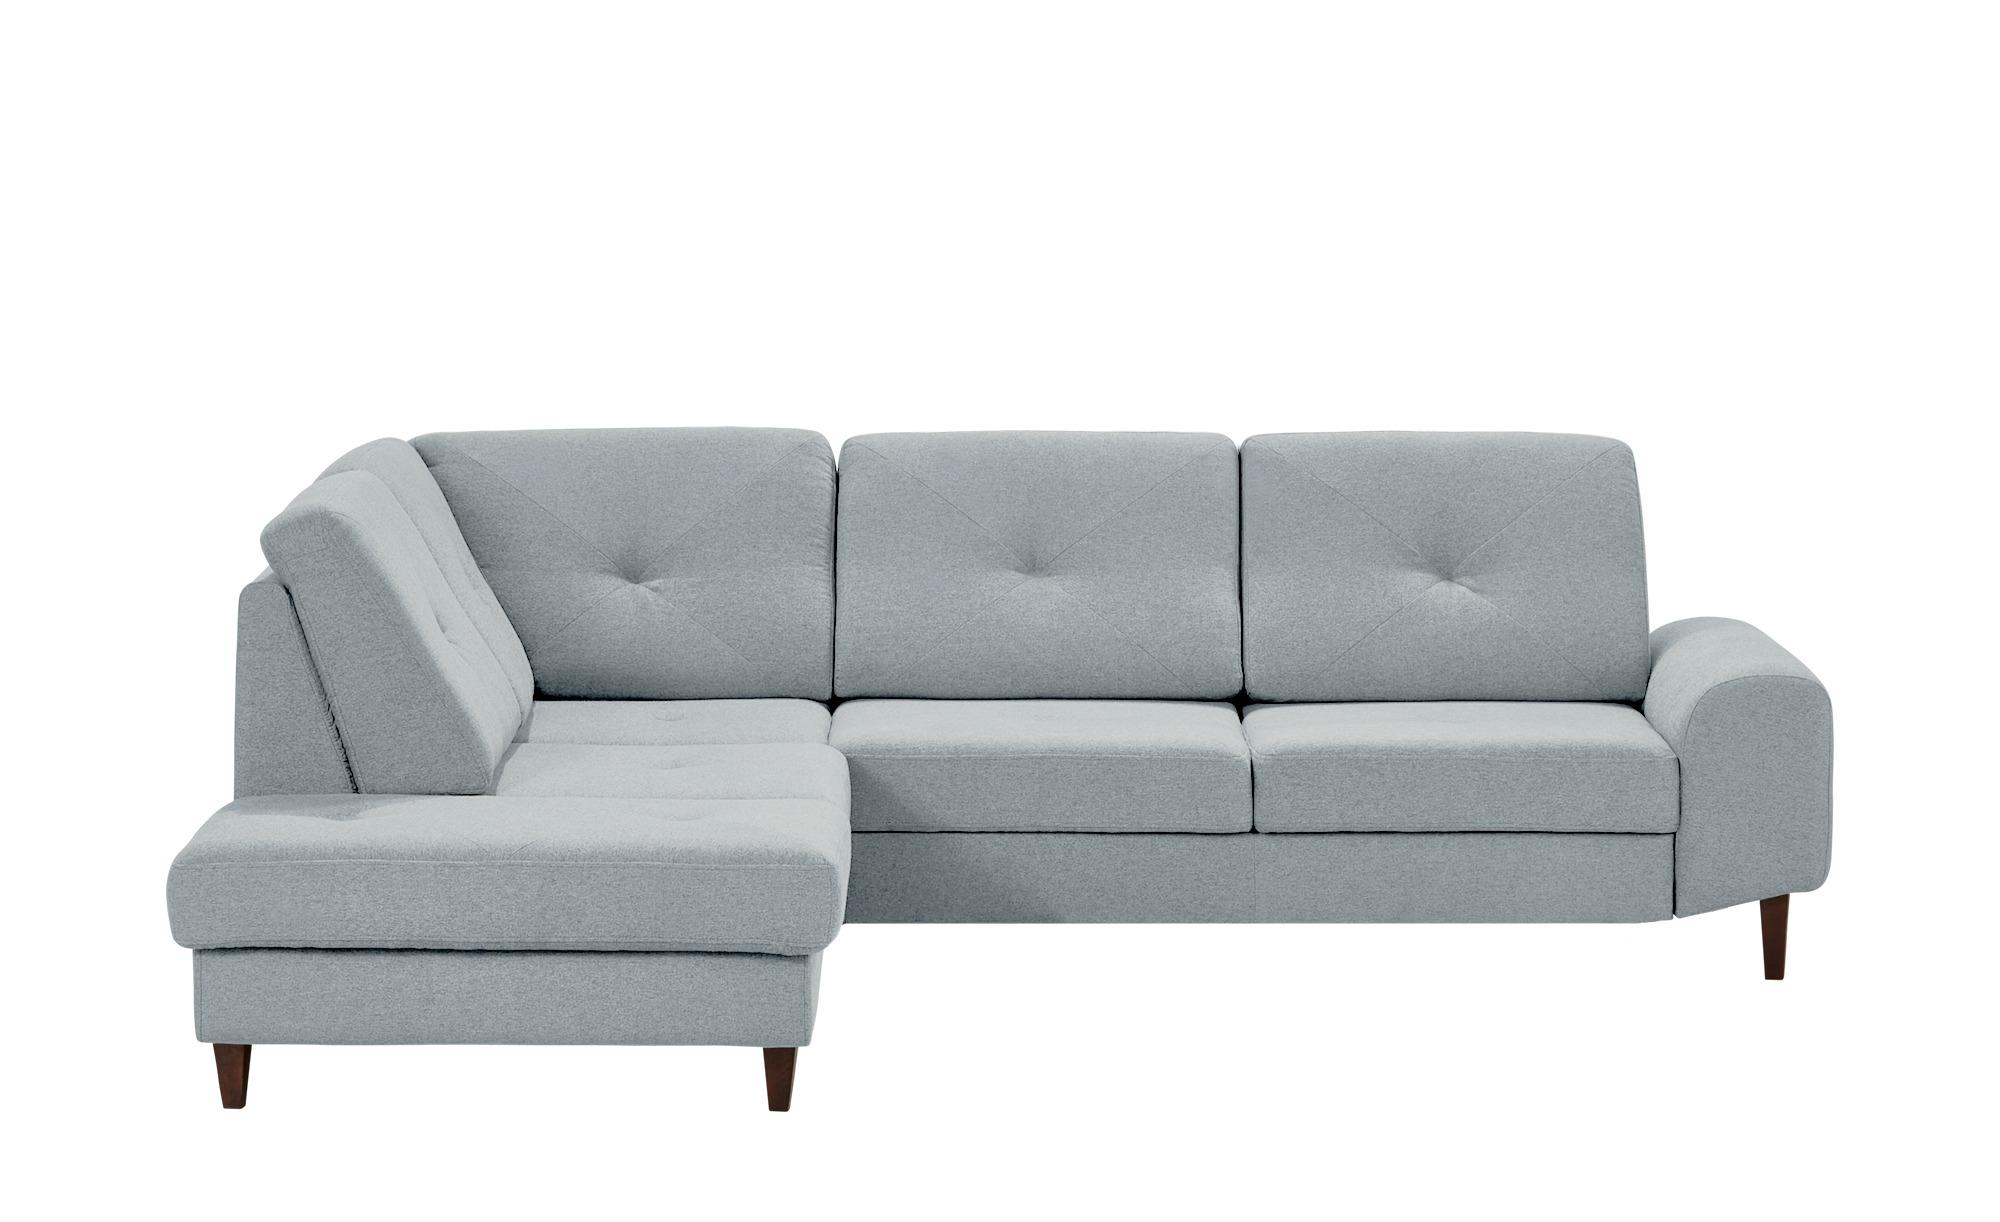 Switch Modernes Ecksofa Grau Webstoff Play Ecksofas Sofa Und Big Sofa Kaufen